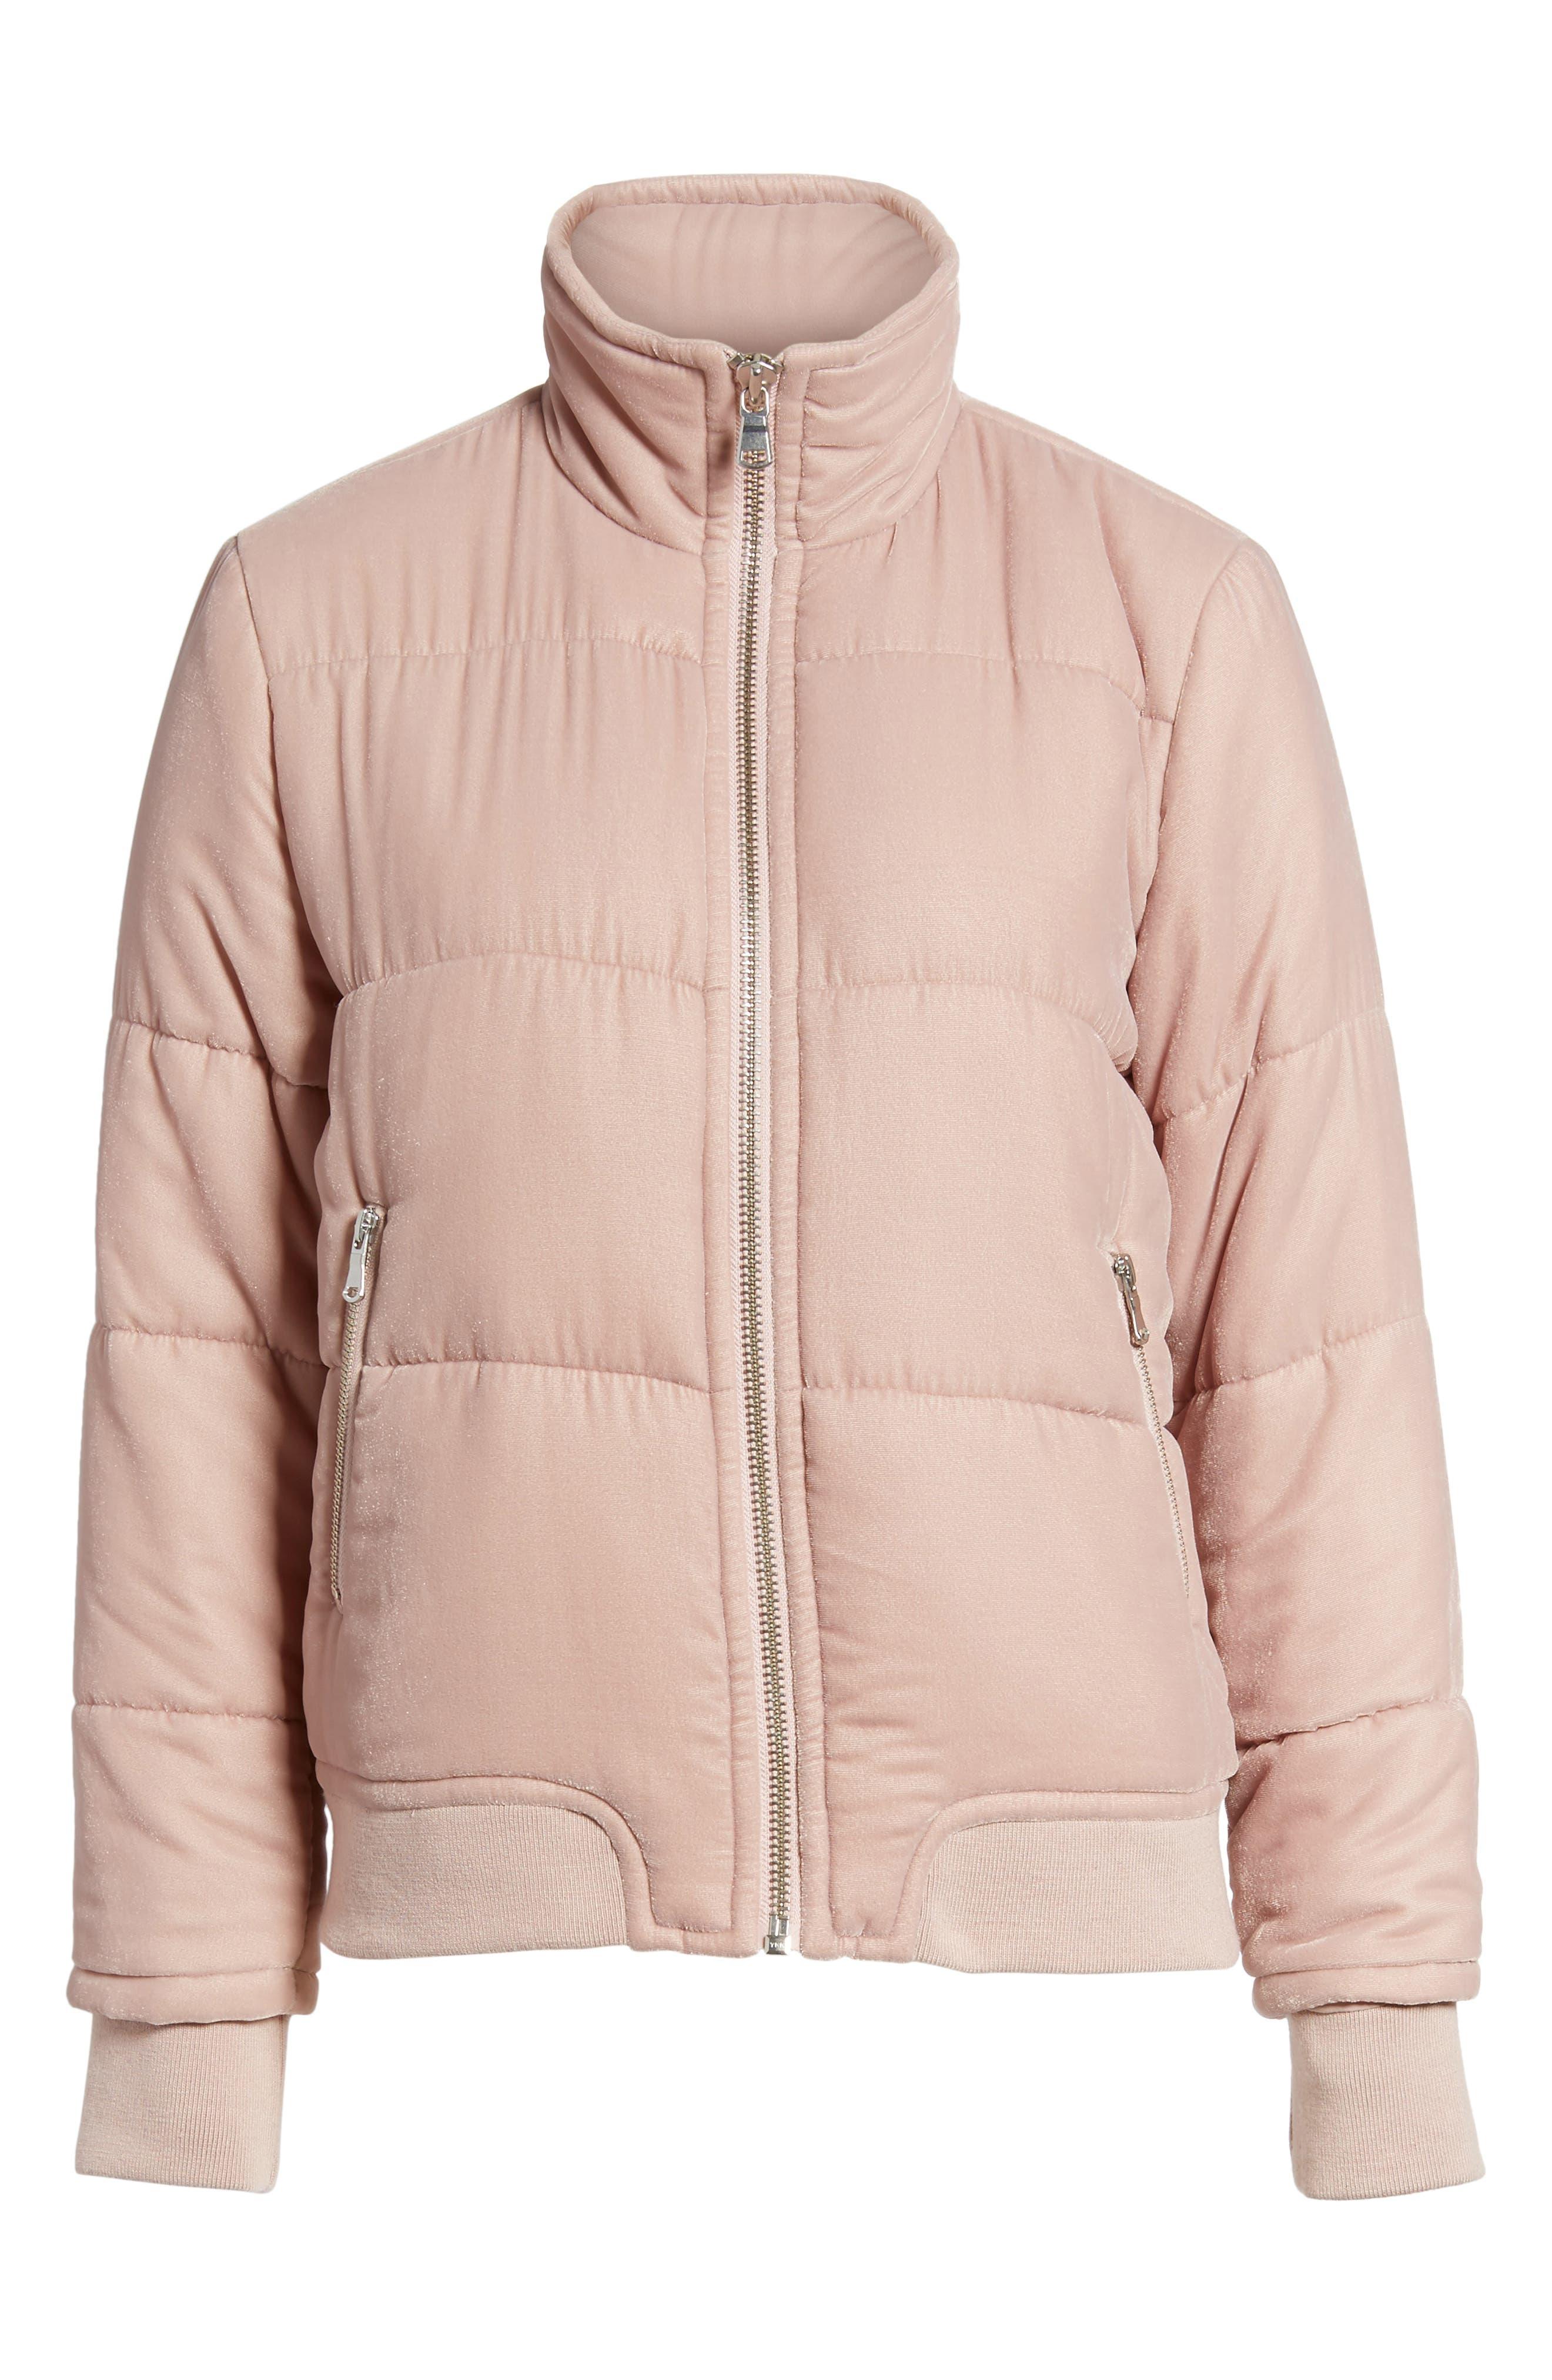 Quilted Velvet Jacket,                             Alternate thumbnail 6, color,                             Pink Adobe